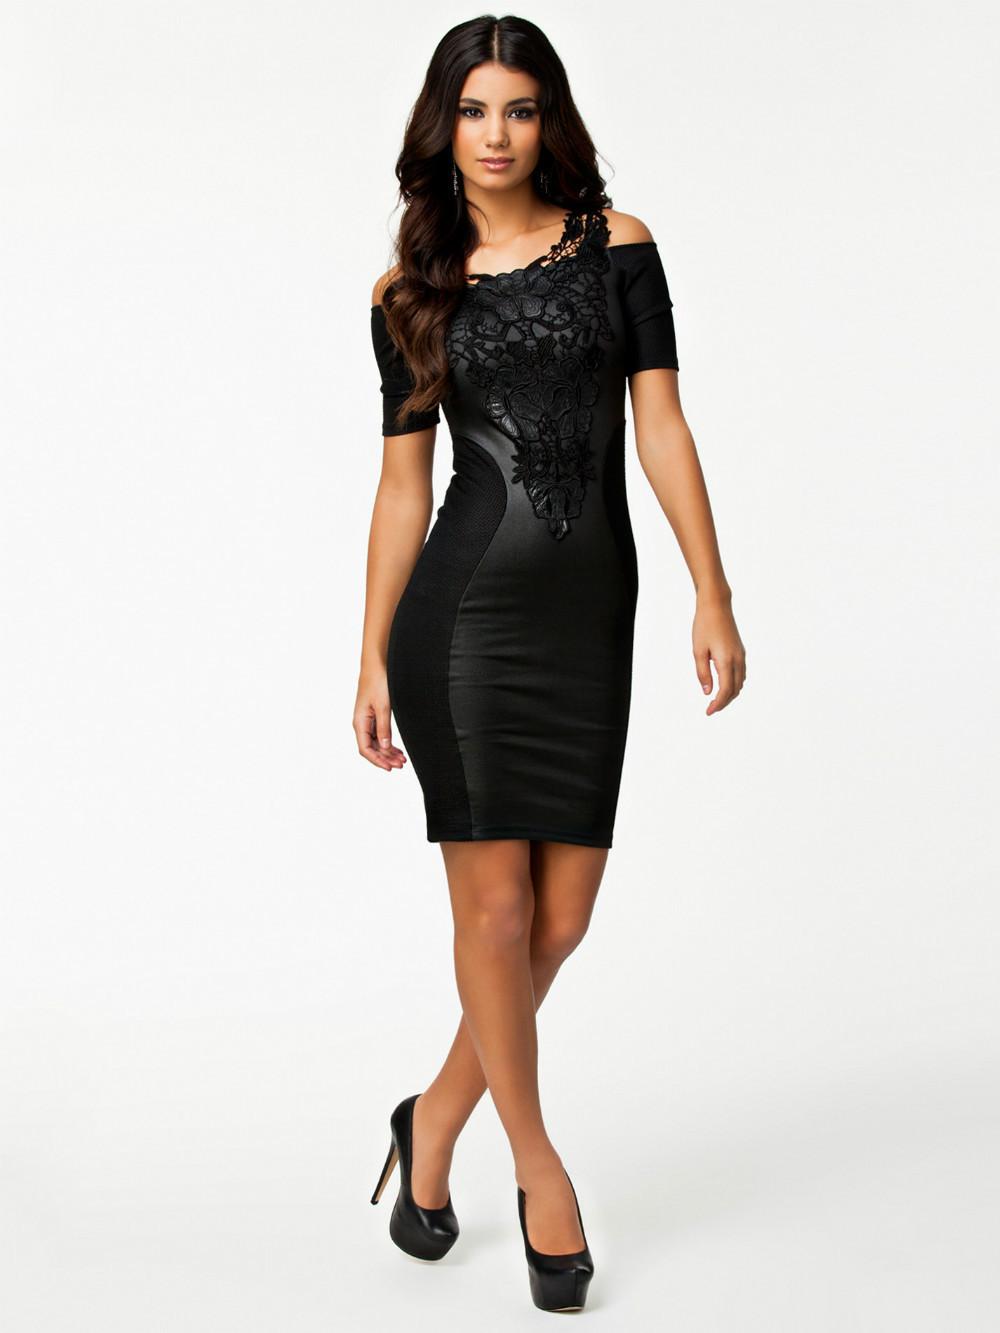 Black dress woman - Black Dress For Women